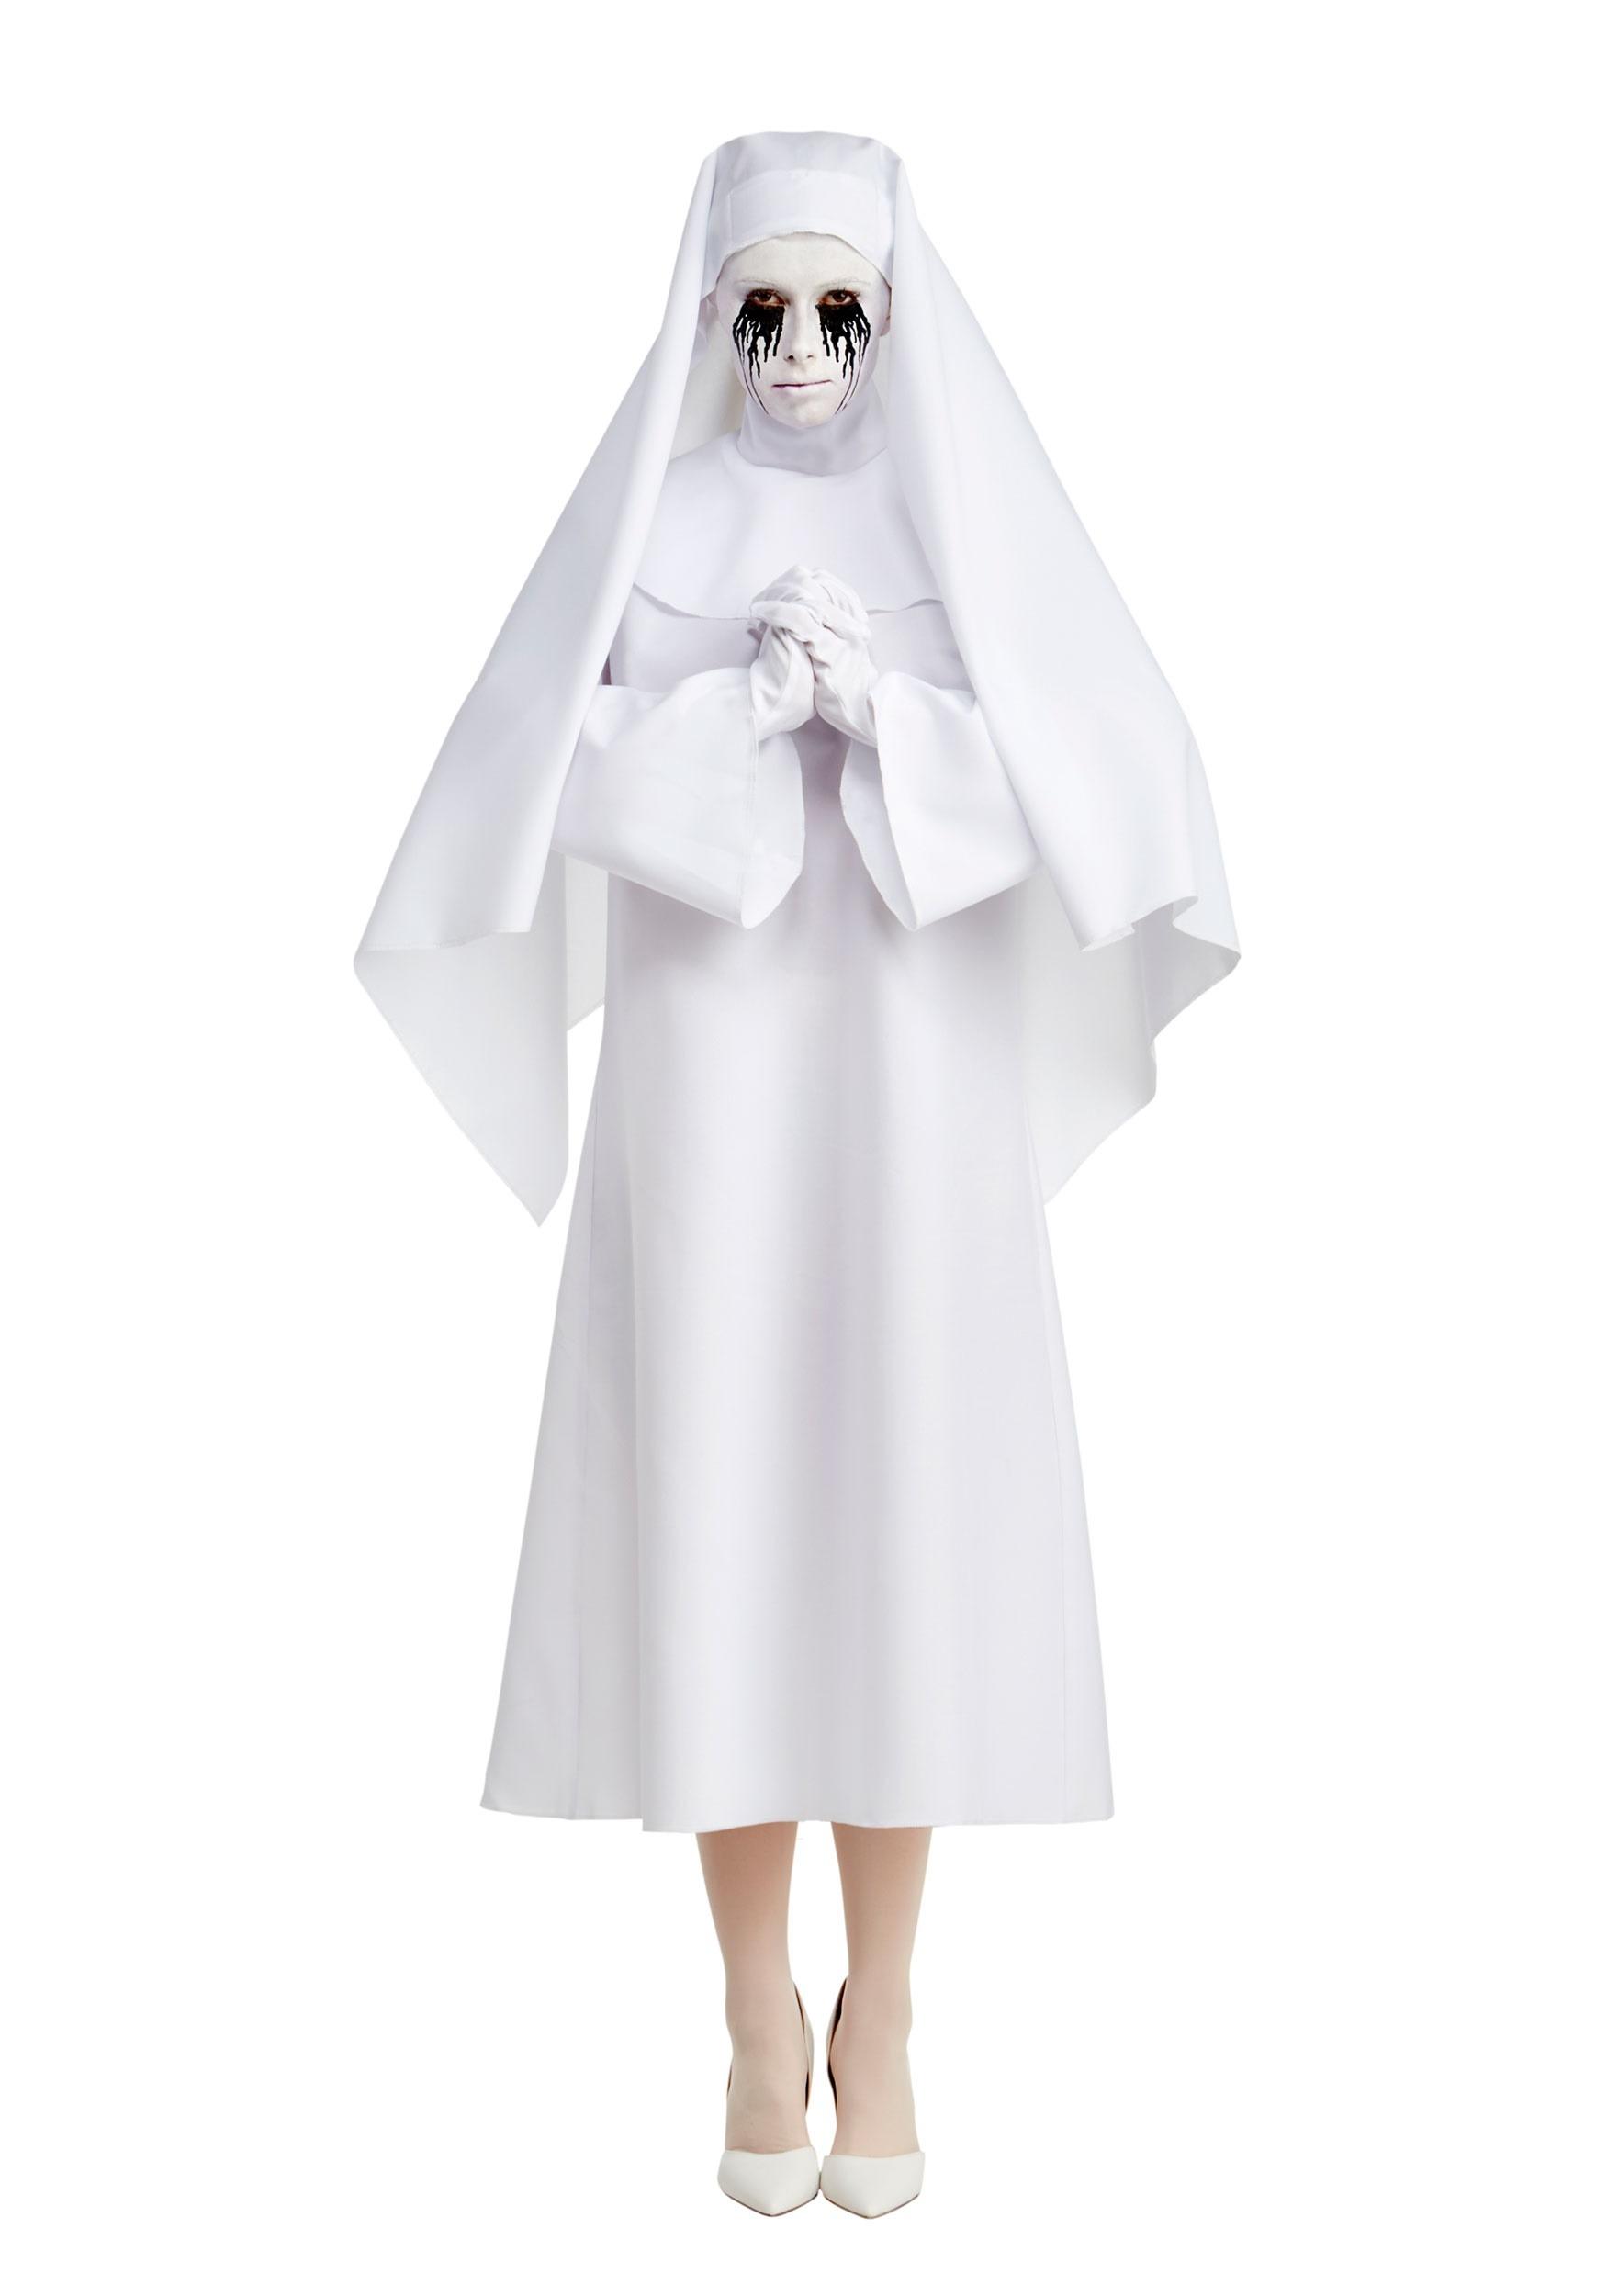 American Horror Story Deluxe The White Nun Womenu0027s Costume  sc 1 st  Fun.com & American Horror Story Deluxe The White Nun Costume for Women